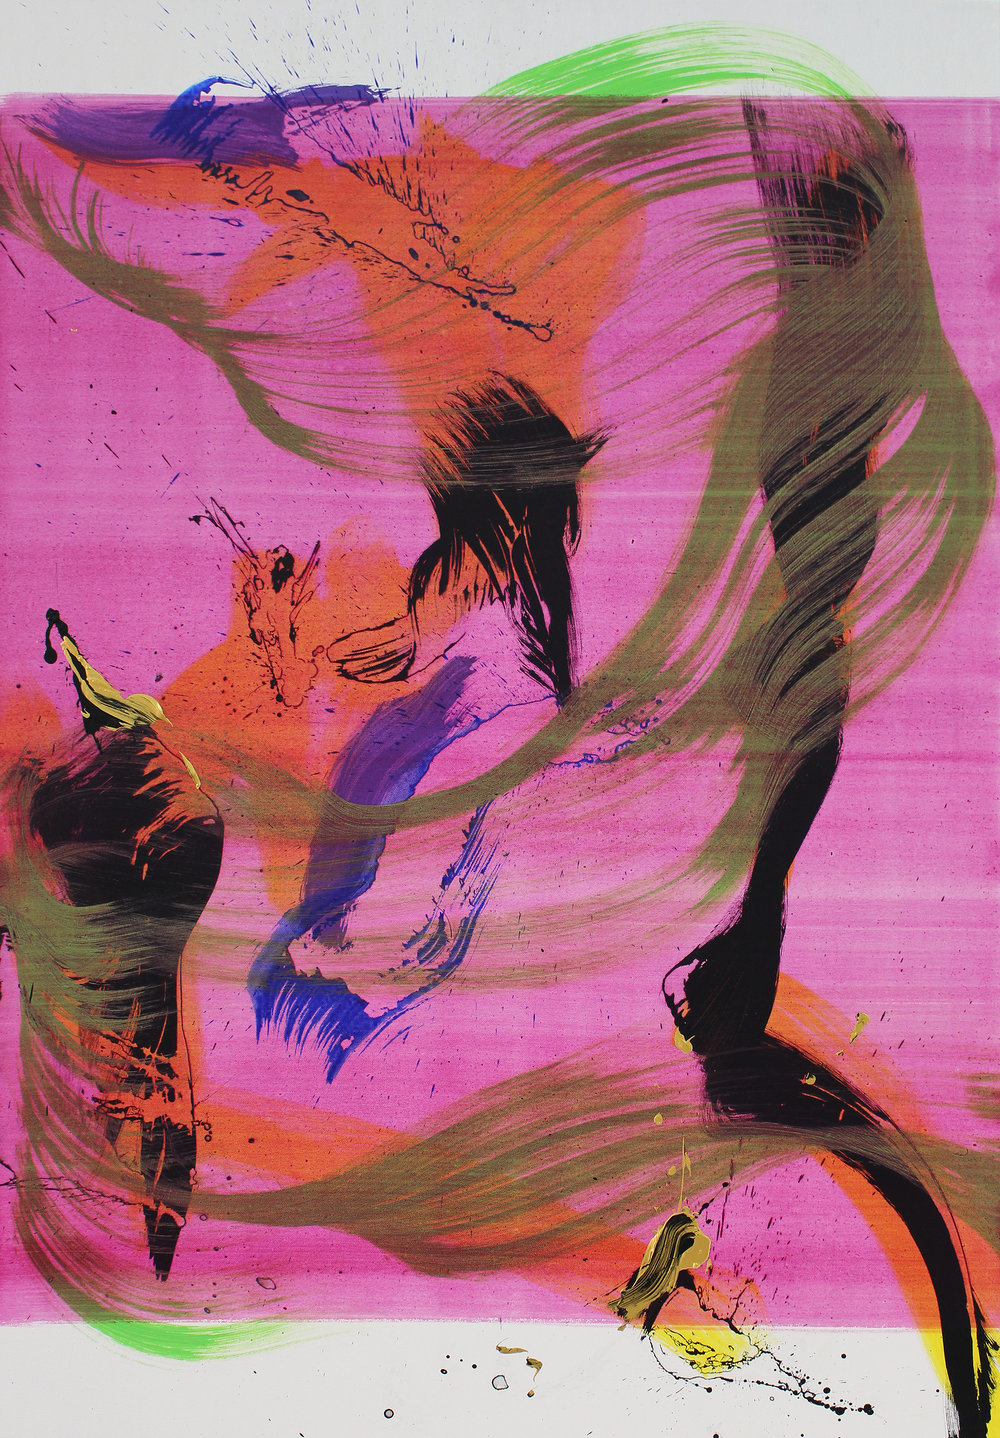 Juan Olivares-Barricade XIV-2018- 130 x 90 x 4 cm-Acrylic on canvas.jpg